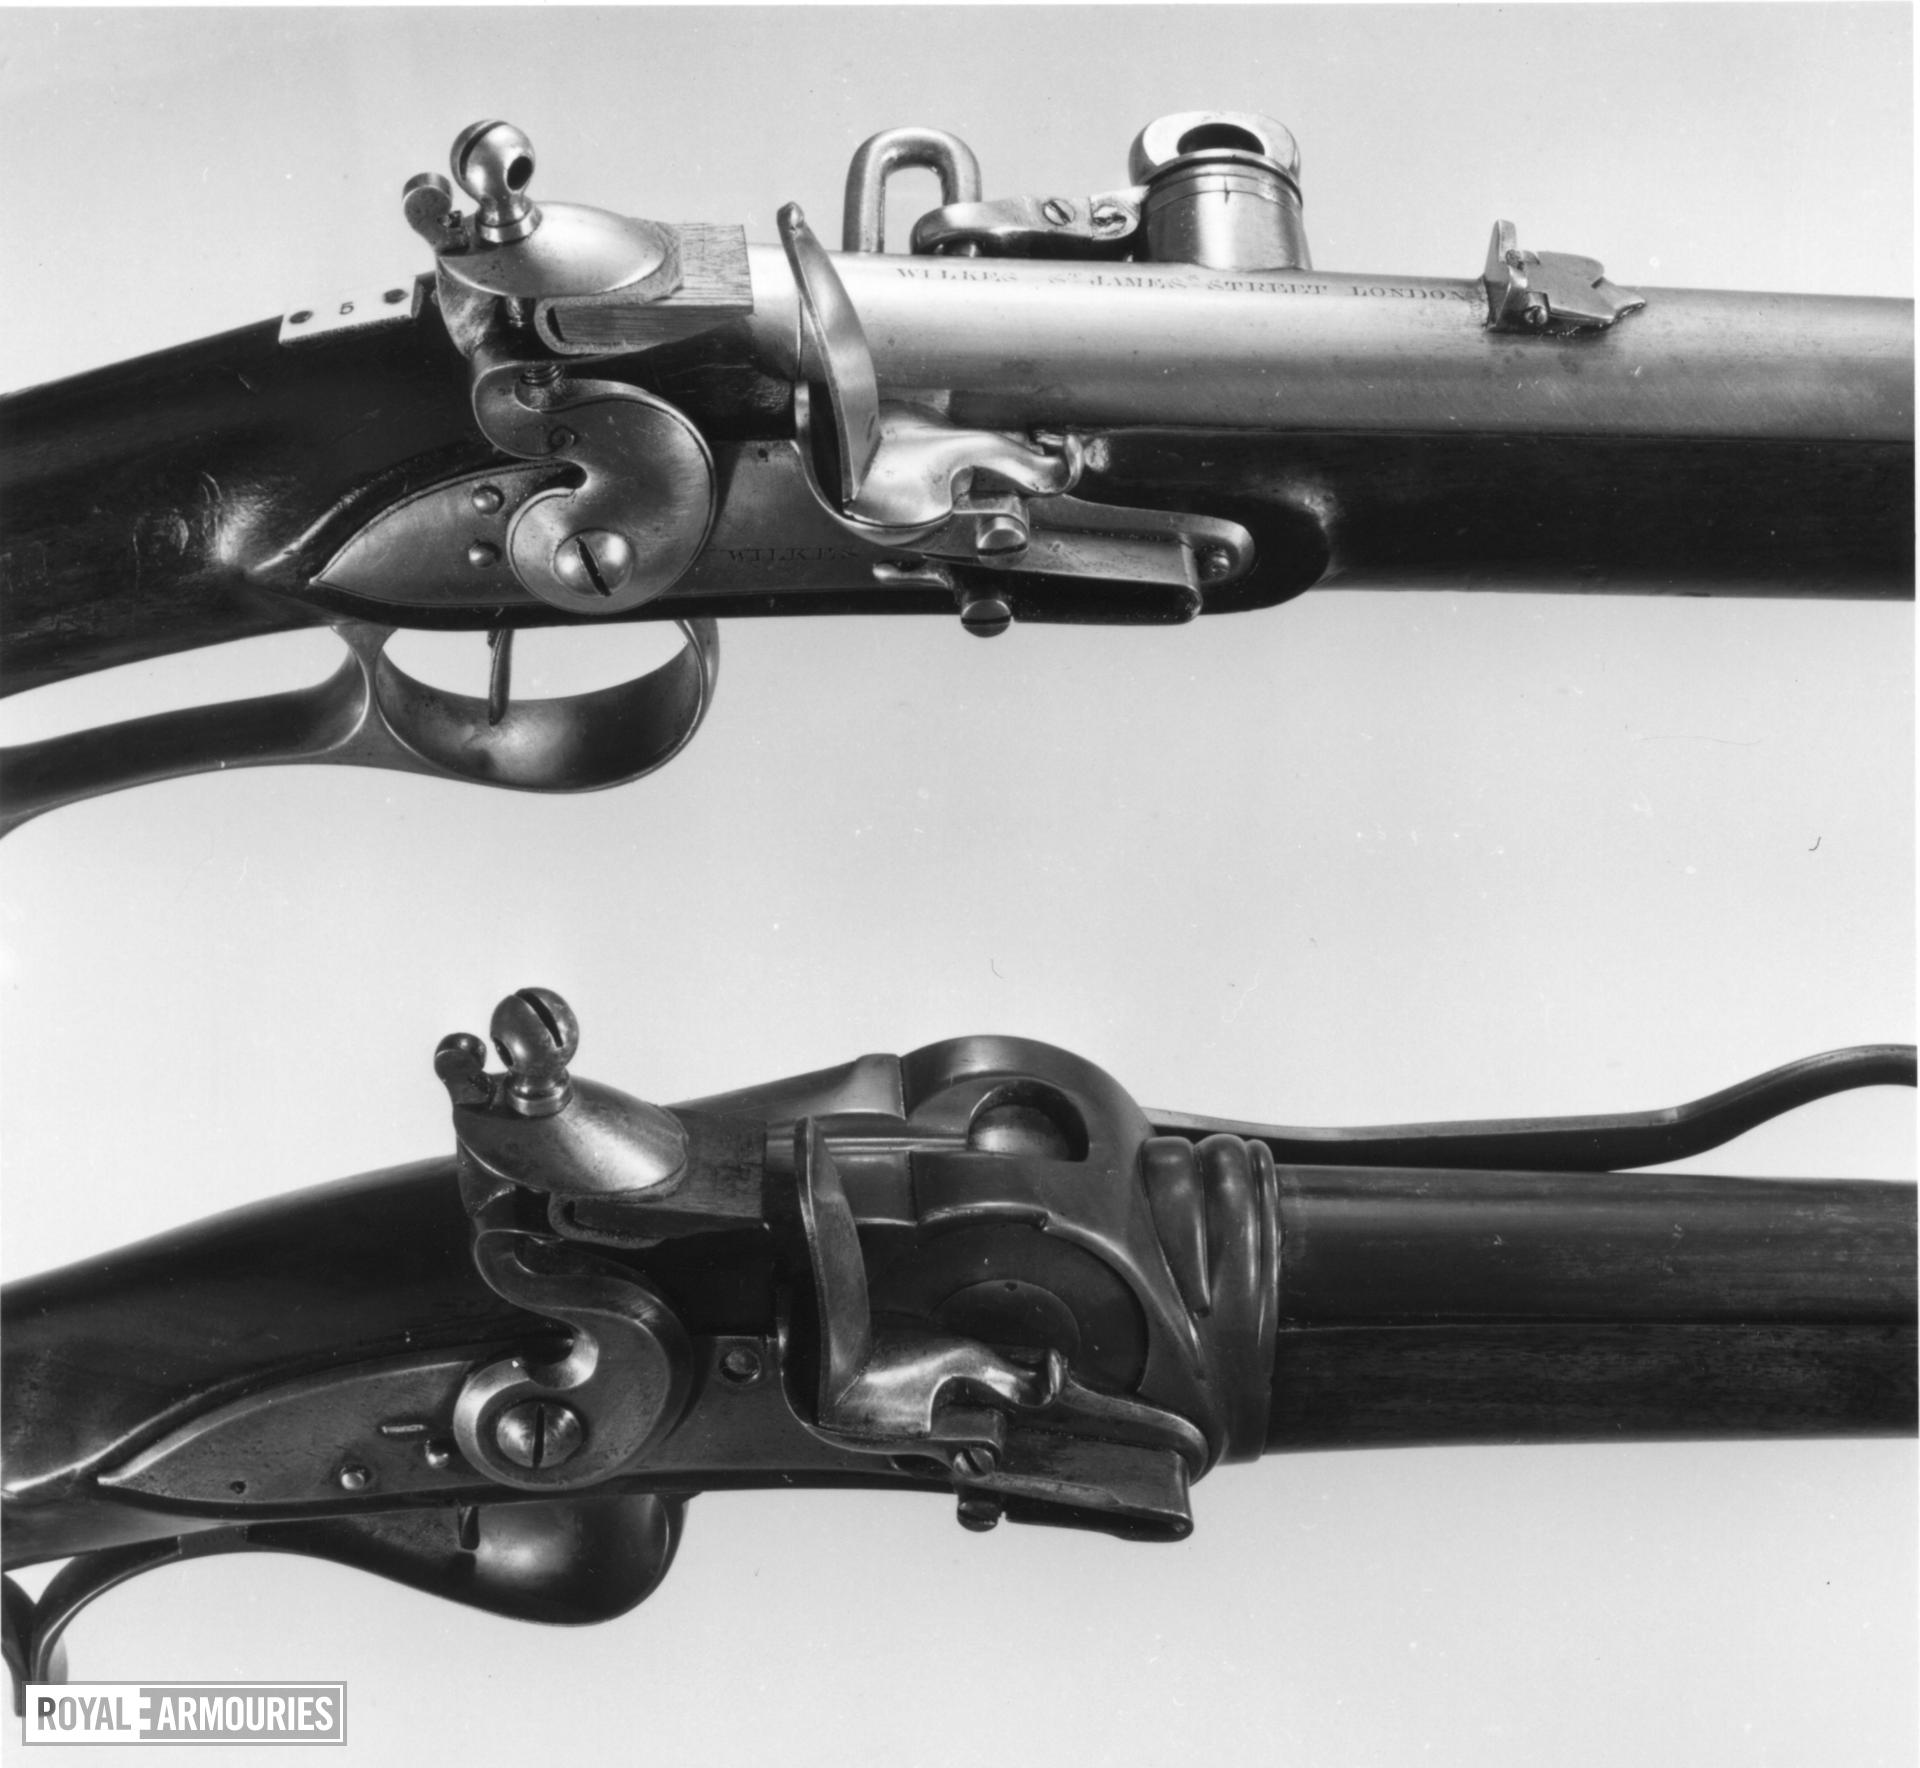 Flintlock breech-loading rifle - Hulme's Rifle Hulme's Rotating-breech rifle